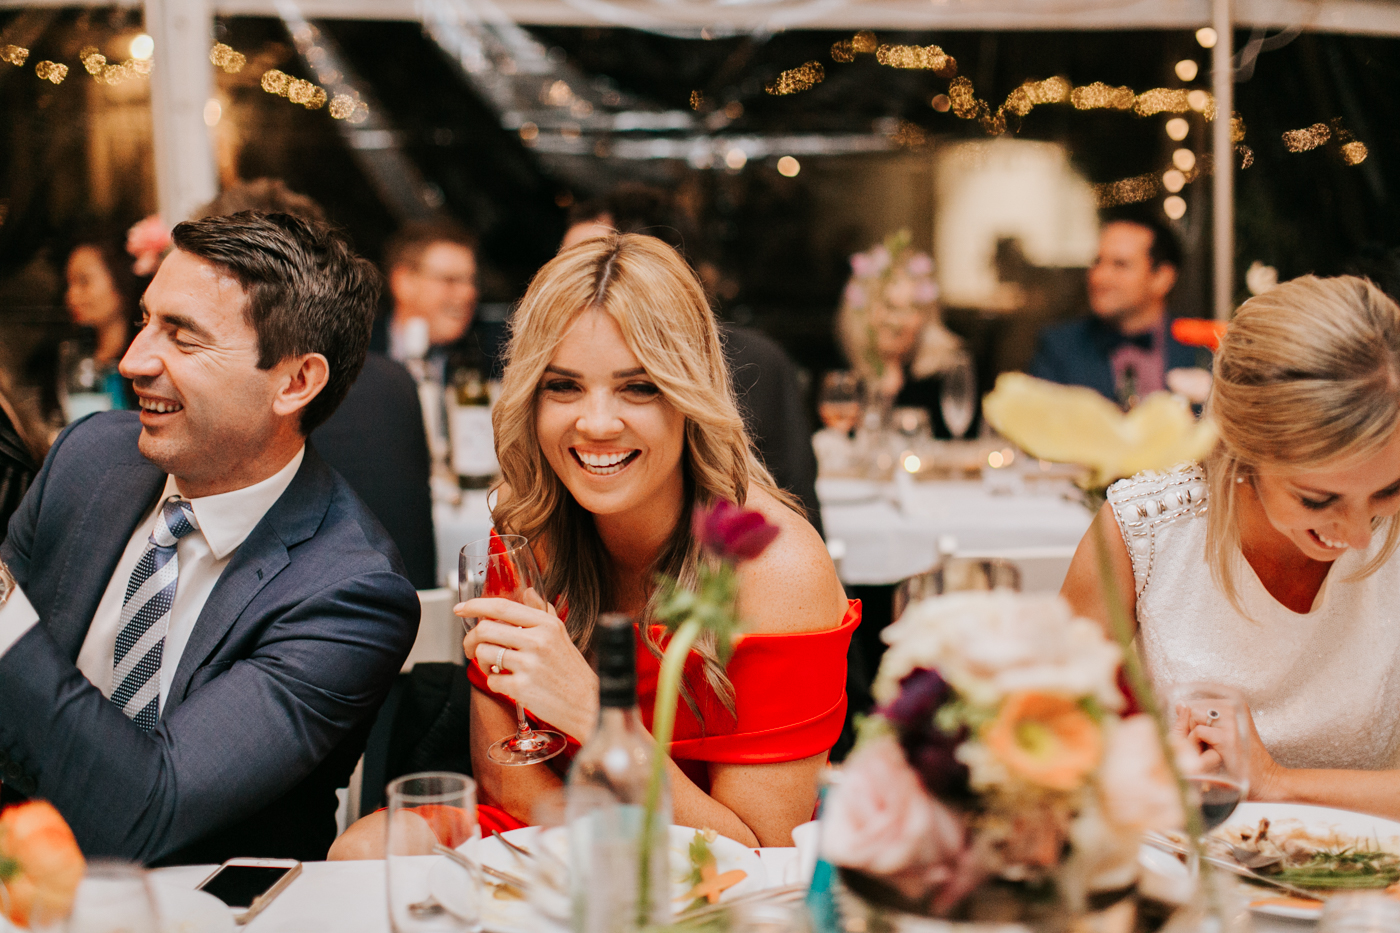 Bridget & James - Orange Country Wedding - Samantha Heather Photography-262.jpg